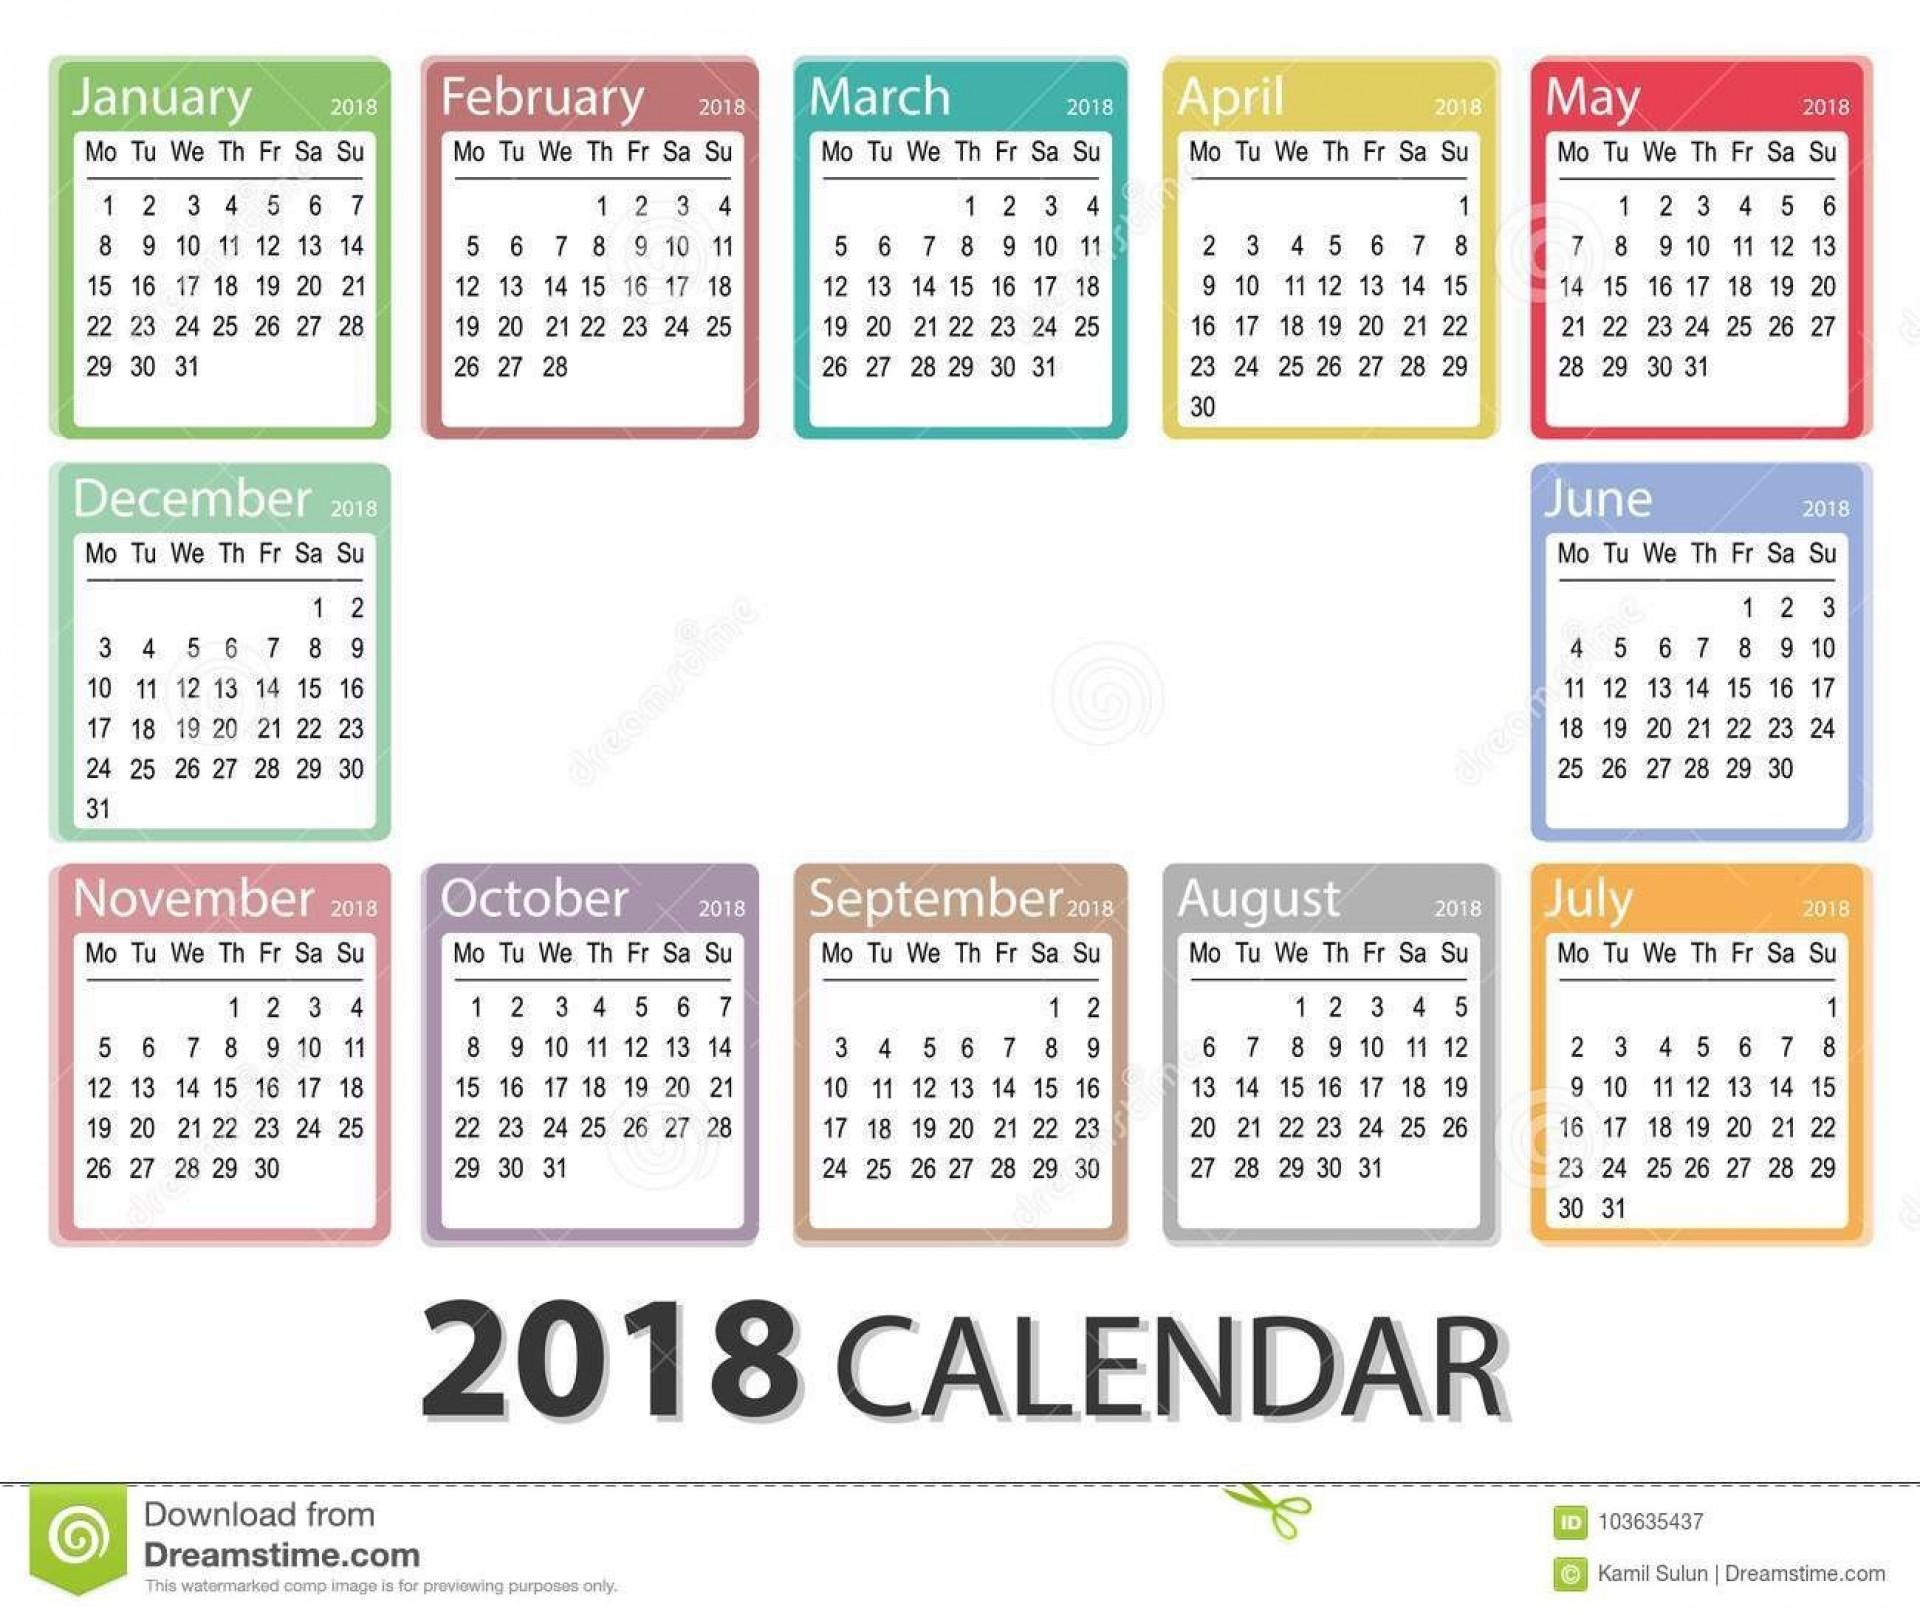 009 Incredible Free Printable Weekly Calendar Template 2018 High Resolution 1920